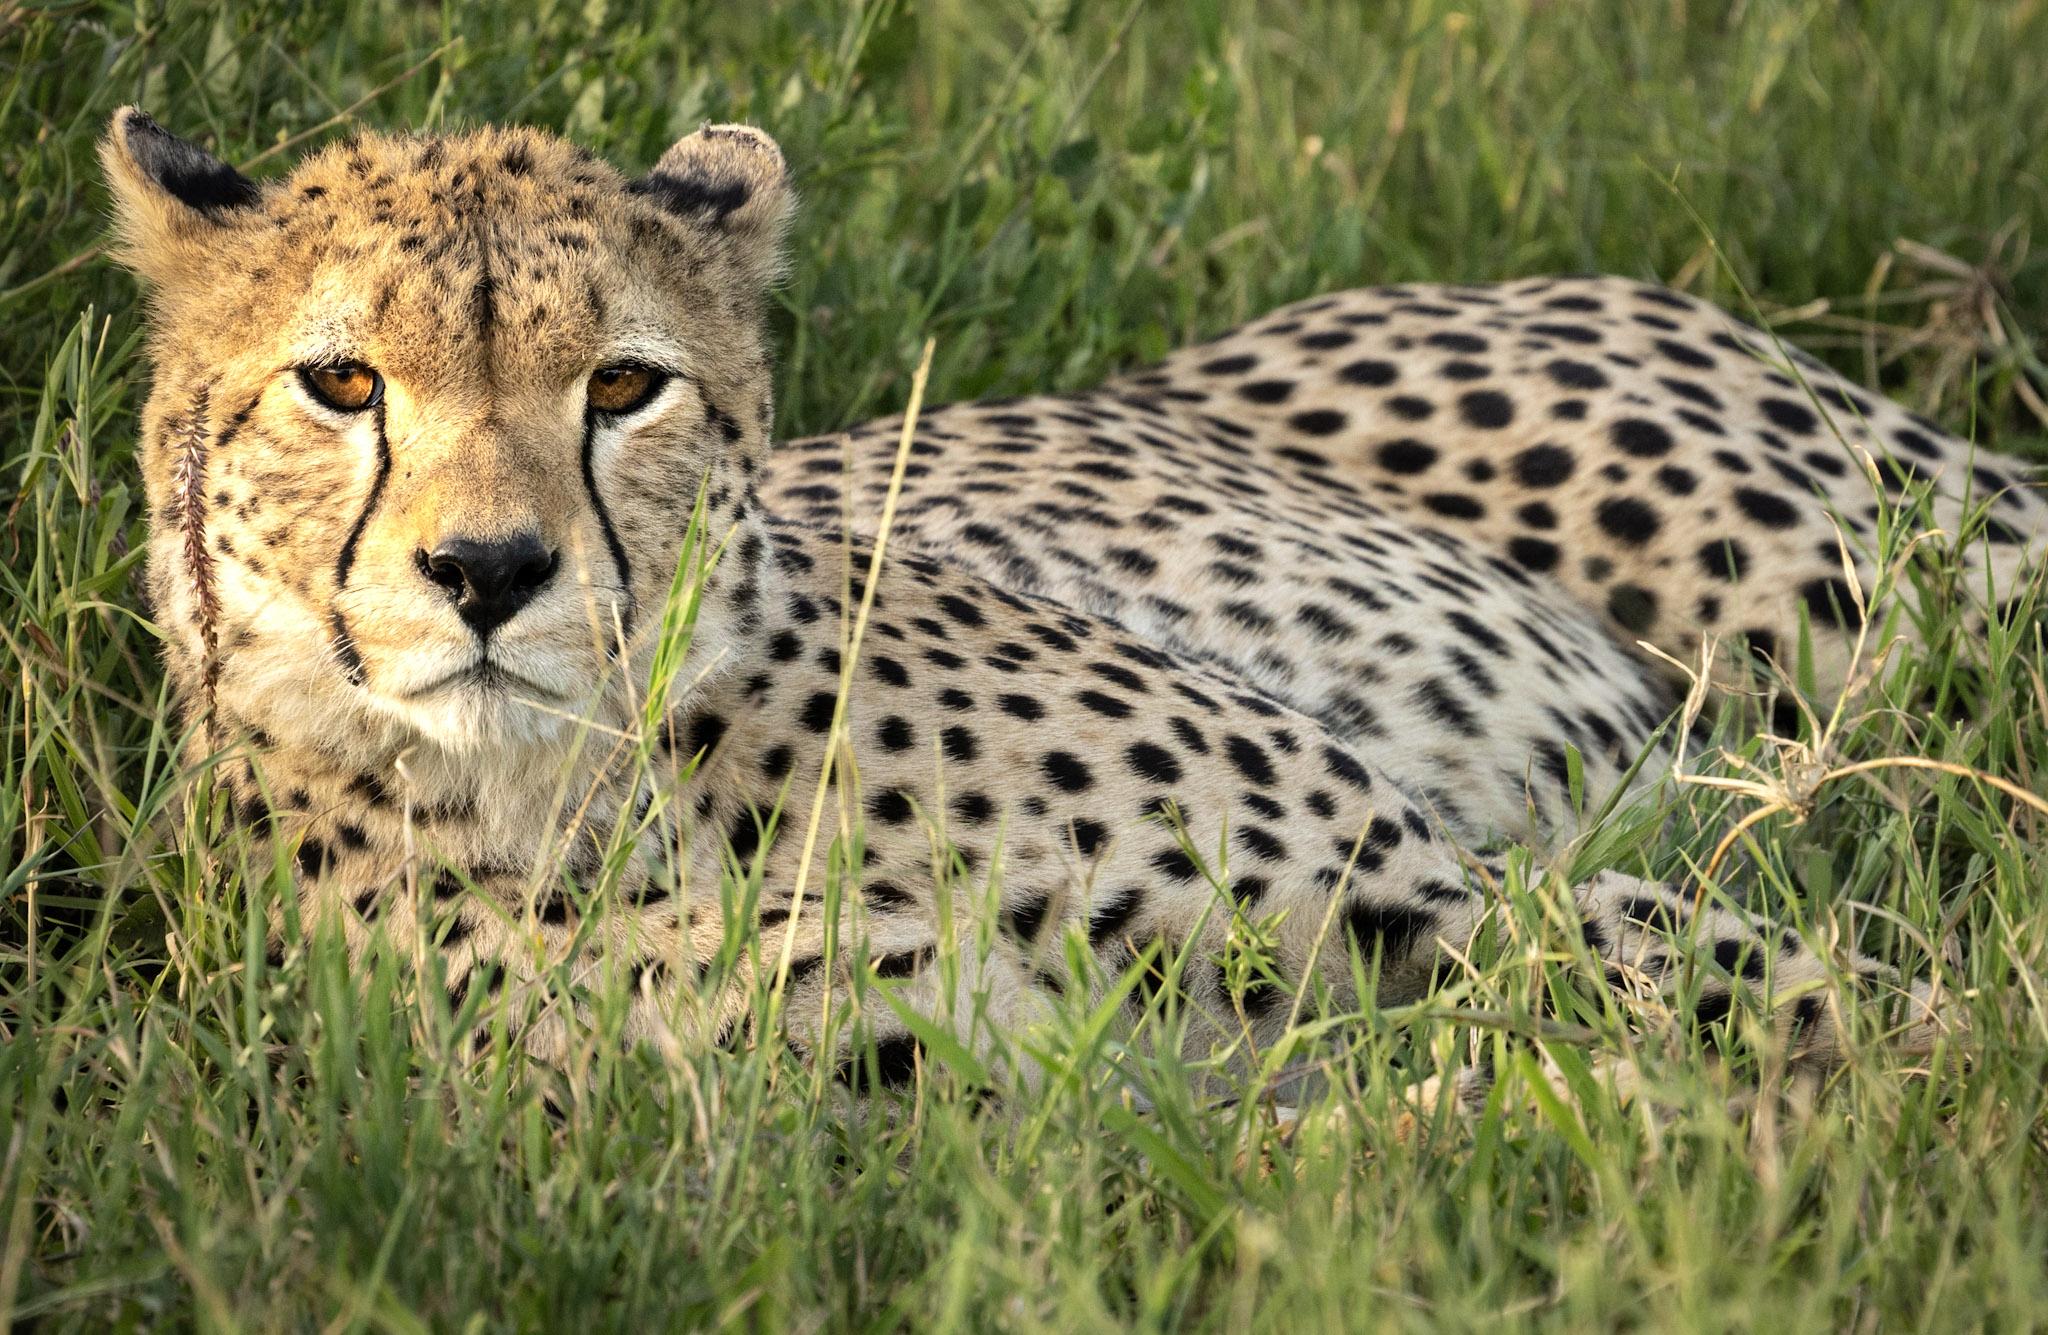 Cheetahs in India